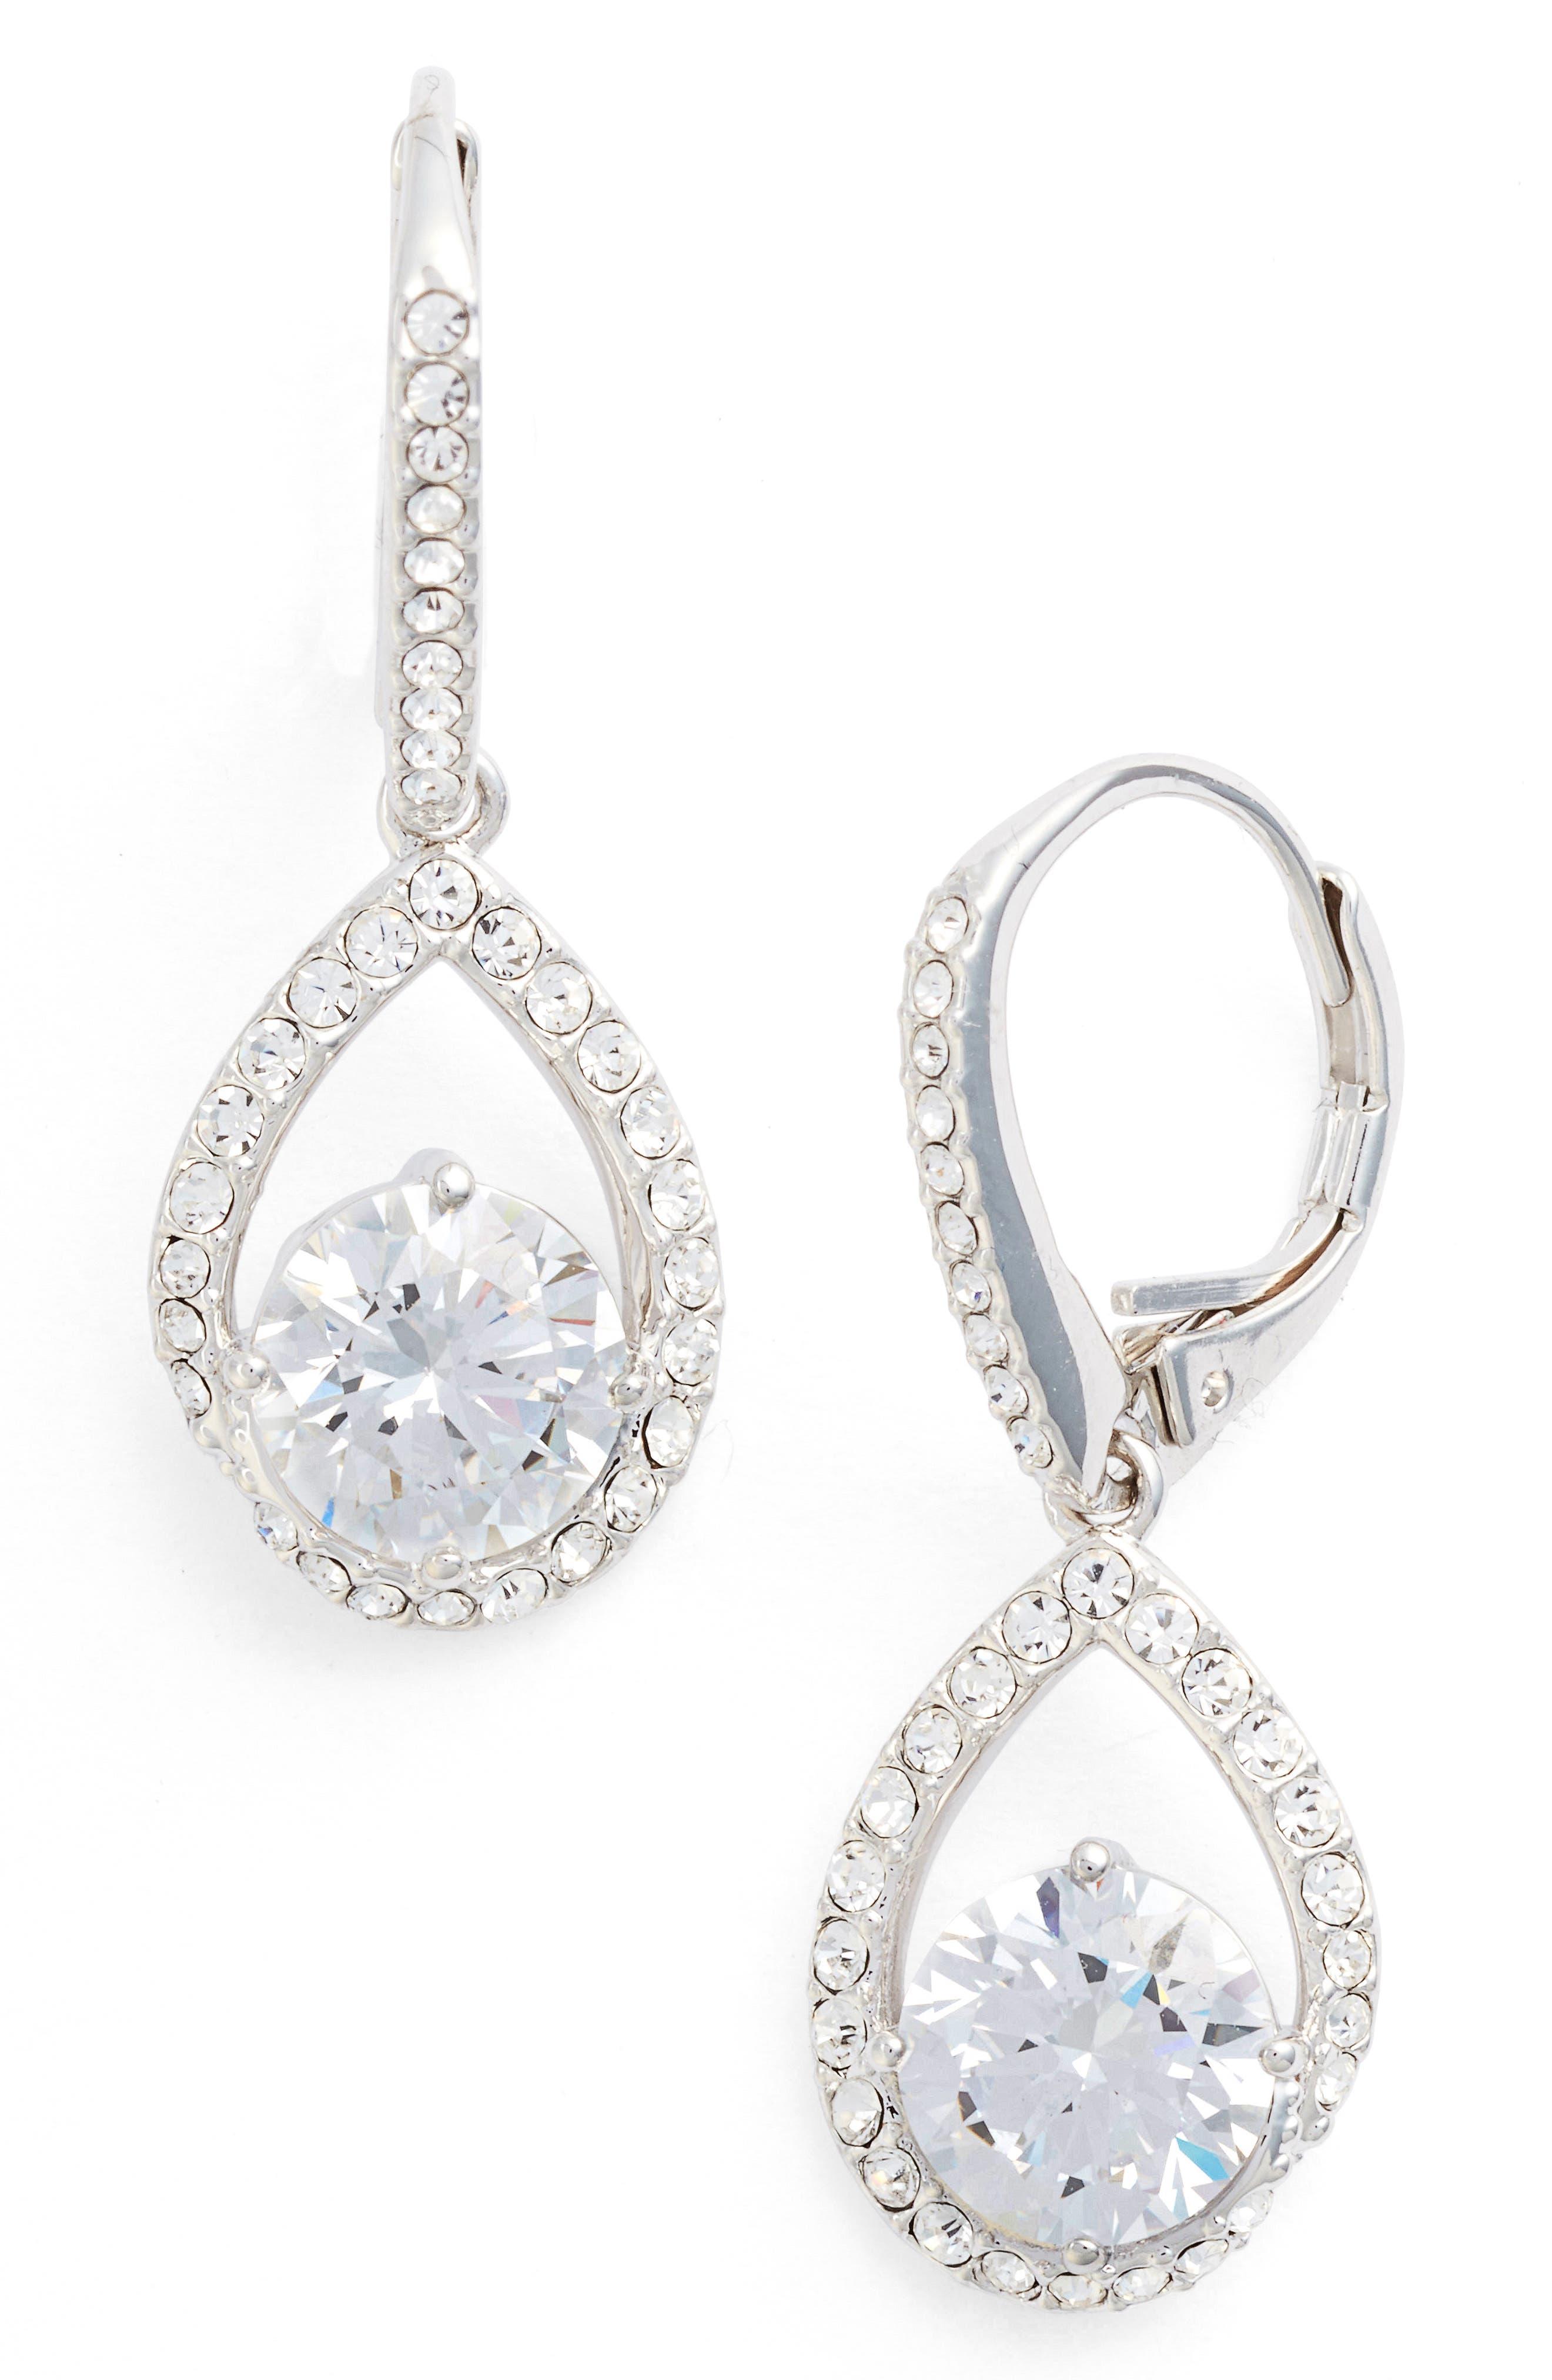 Cubic Zirconia Pear Drop Earrings,                         Main,                         color, Silver